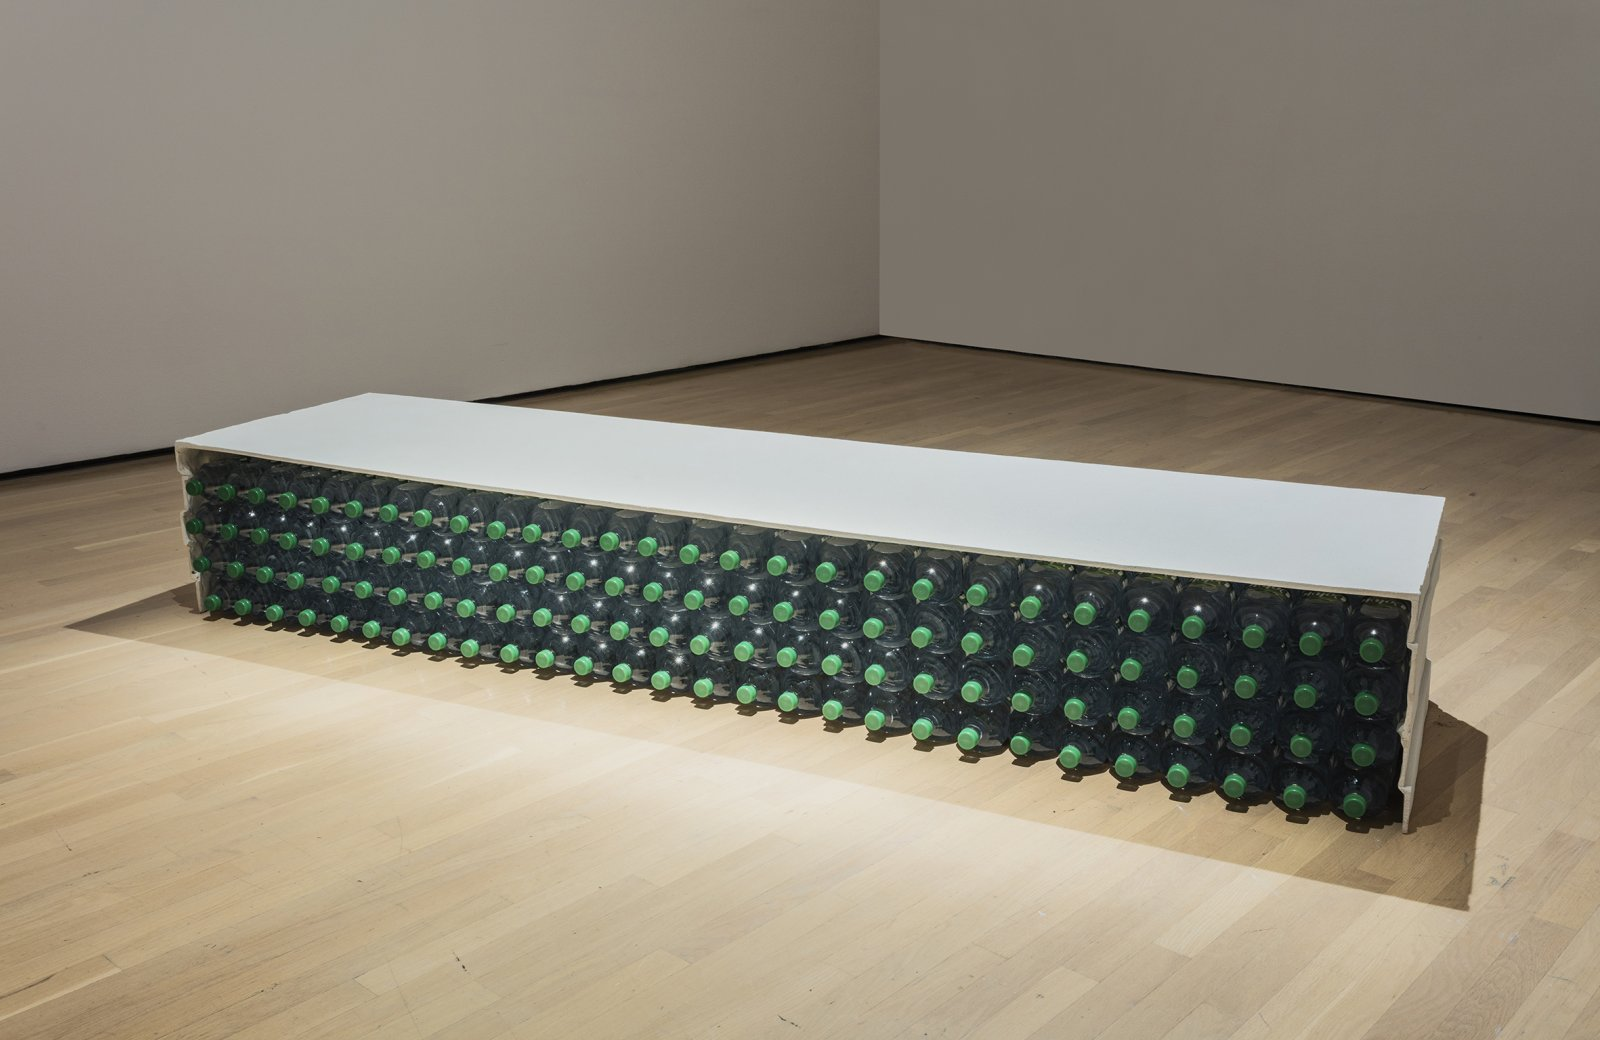 Liz Magor, Volvic, 2002, polymerized gypsum, bottled water, 15 x 96 x 24 in. (38 x 245 x 61 cm) by Liz Magor